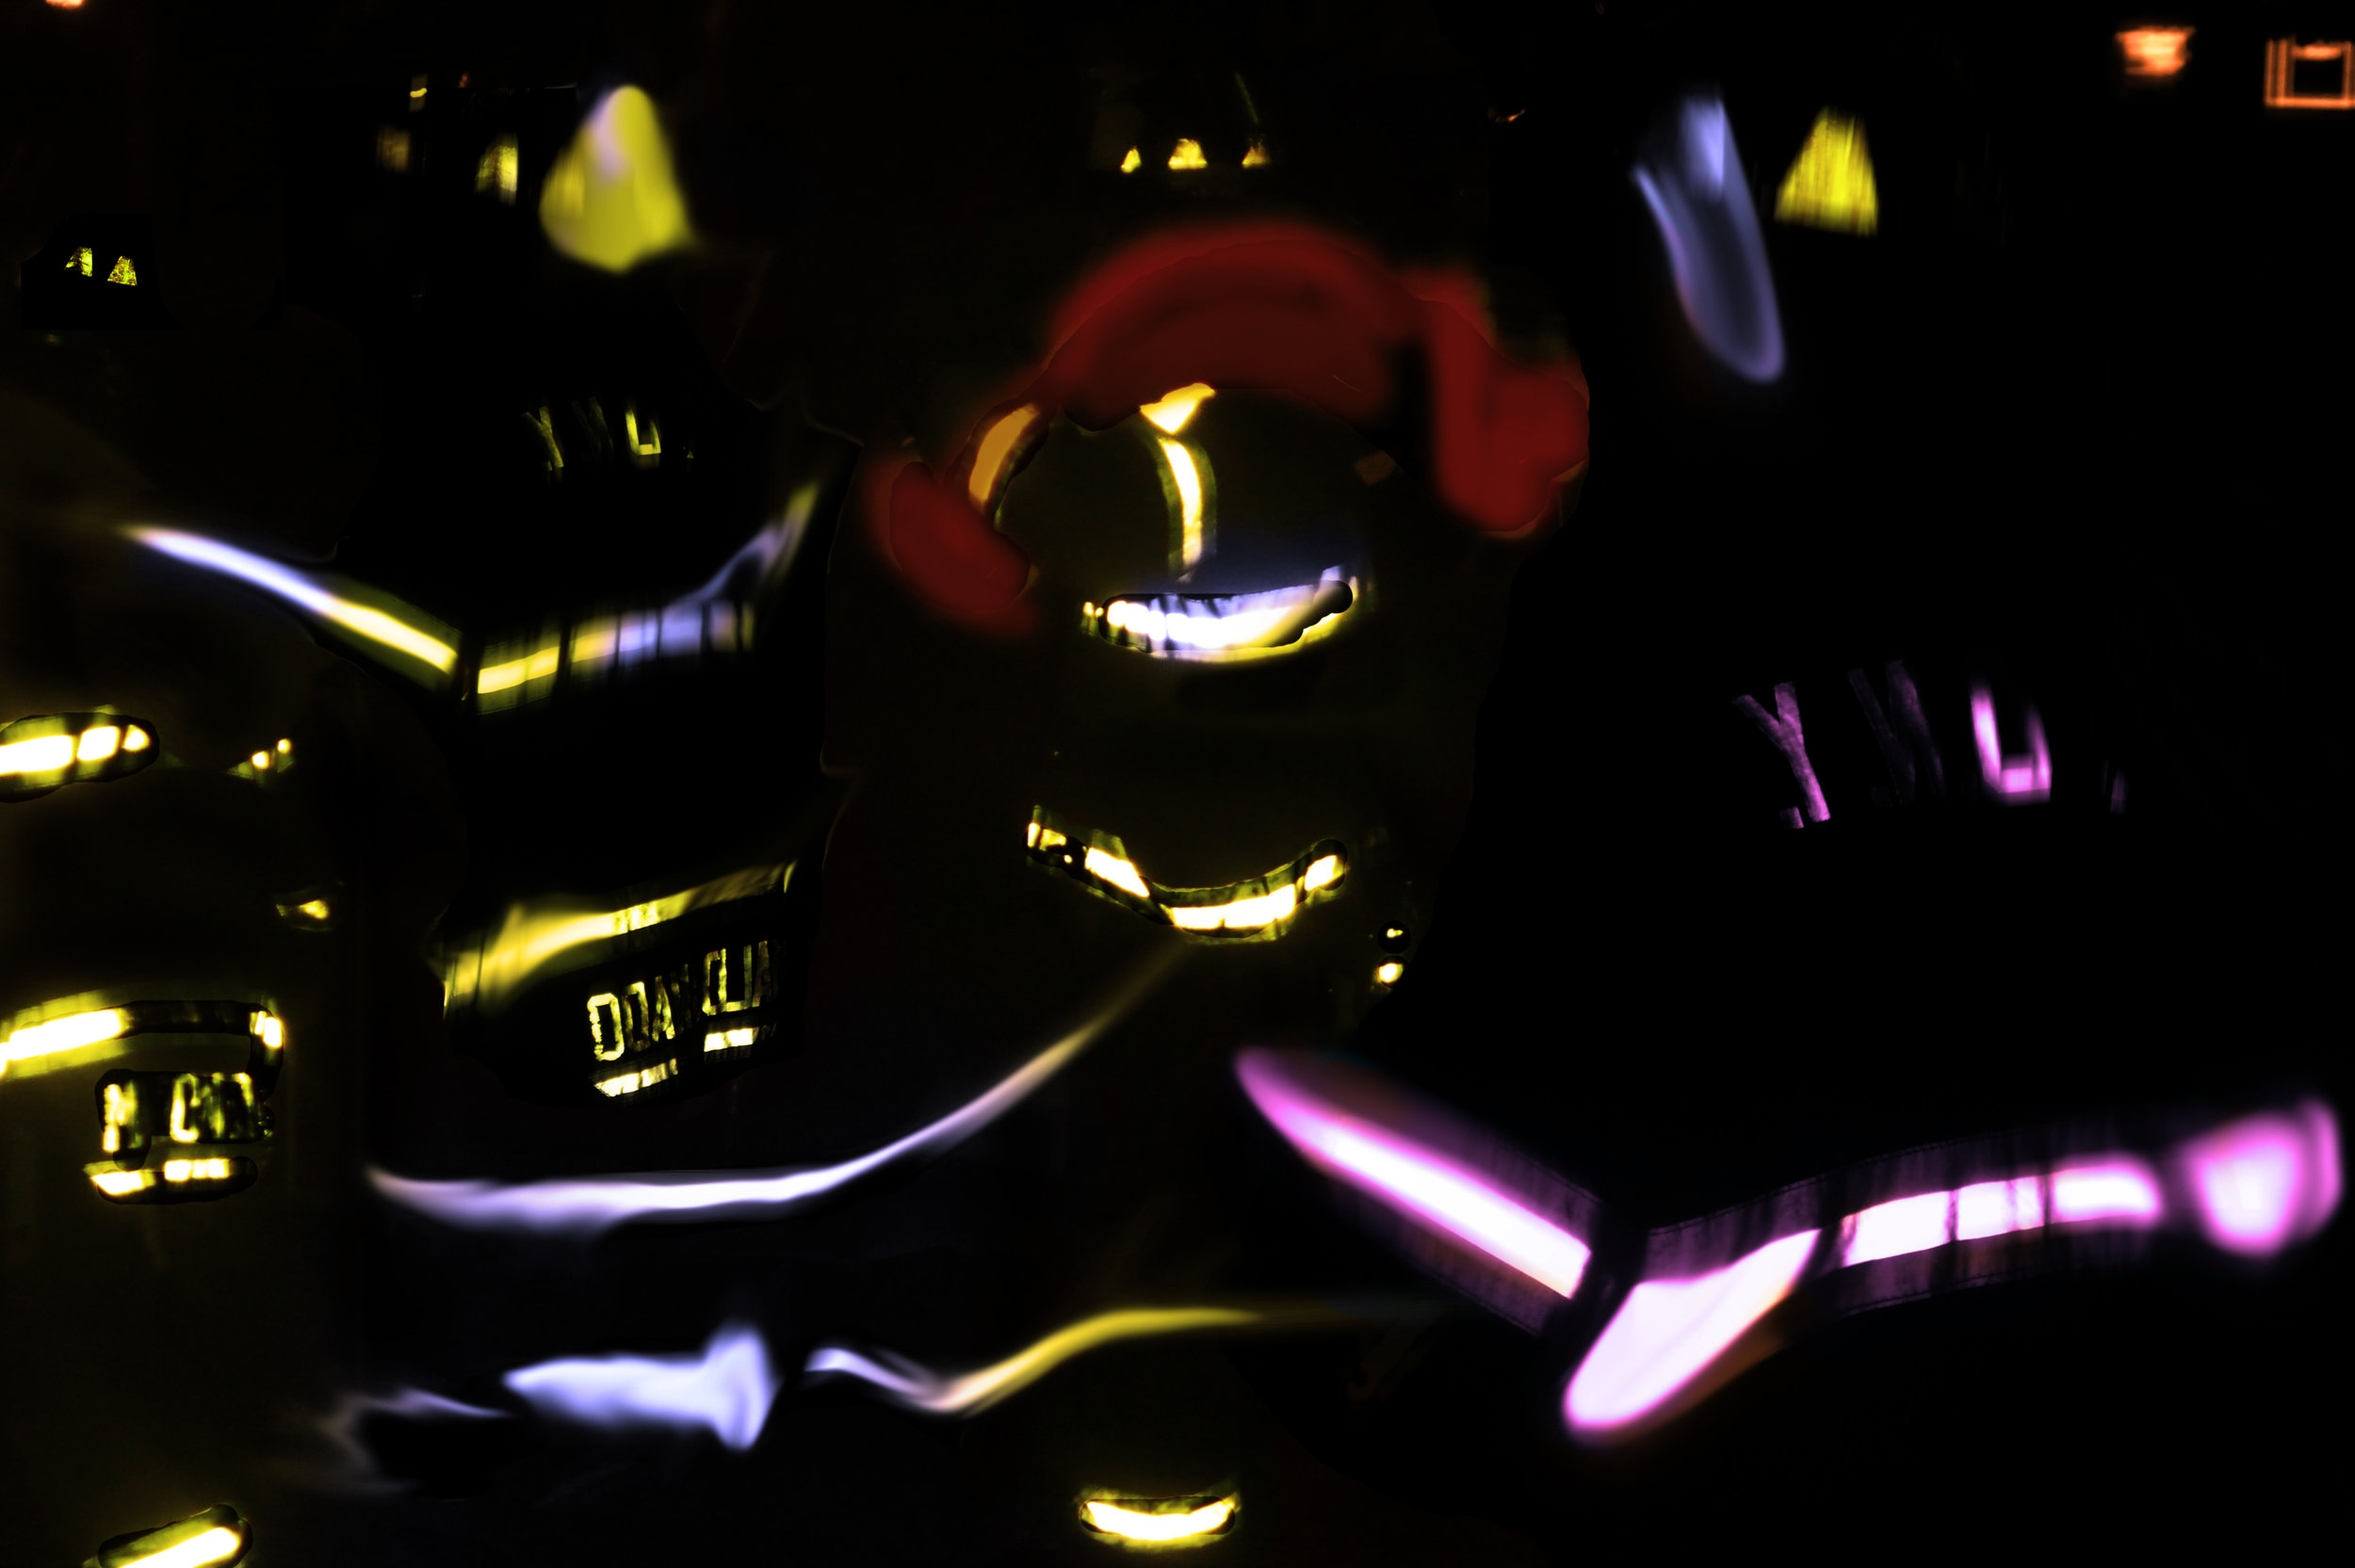 'Glow 6' 2009 © Andrea Blanch